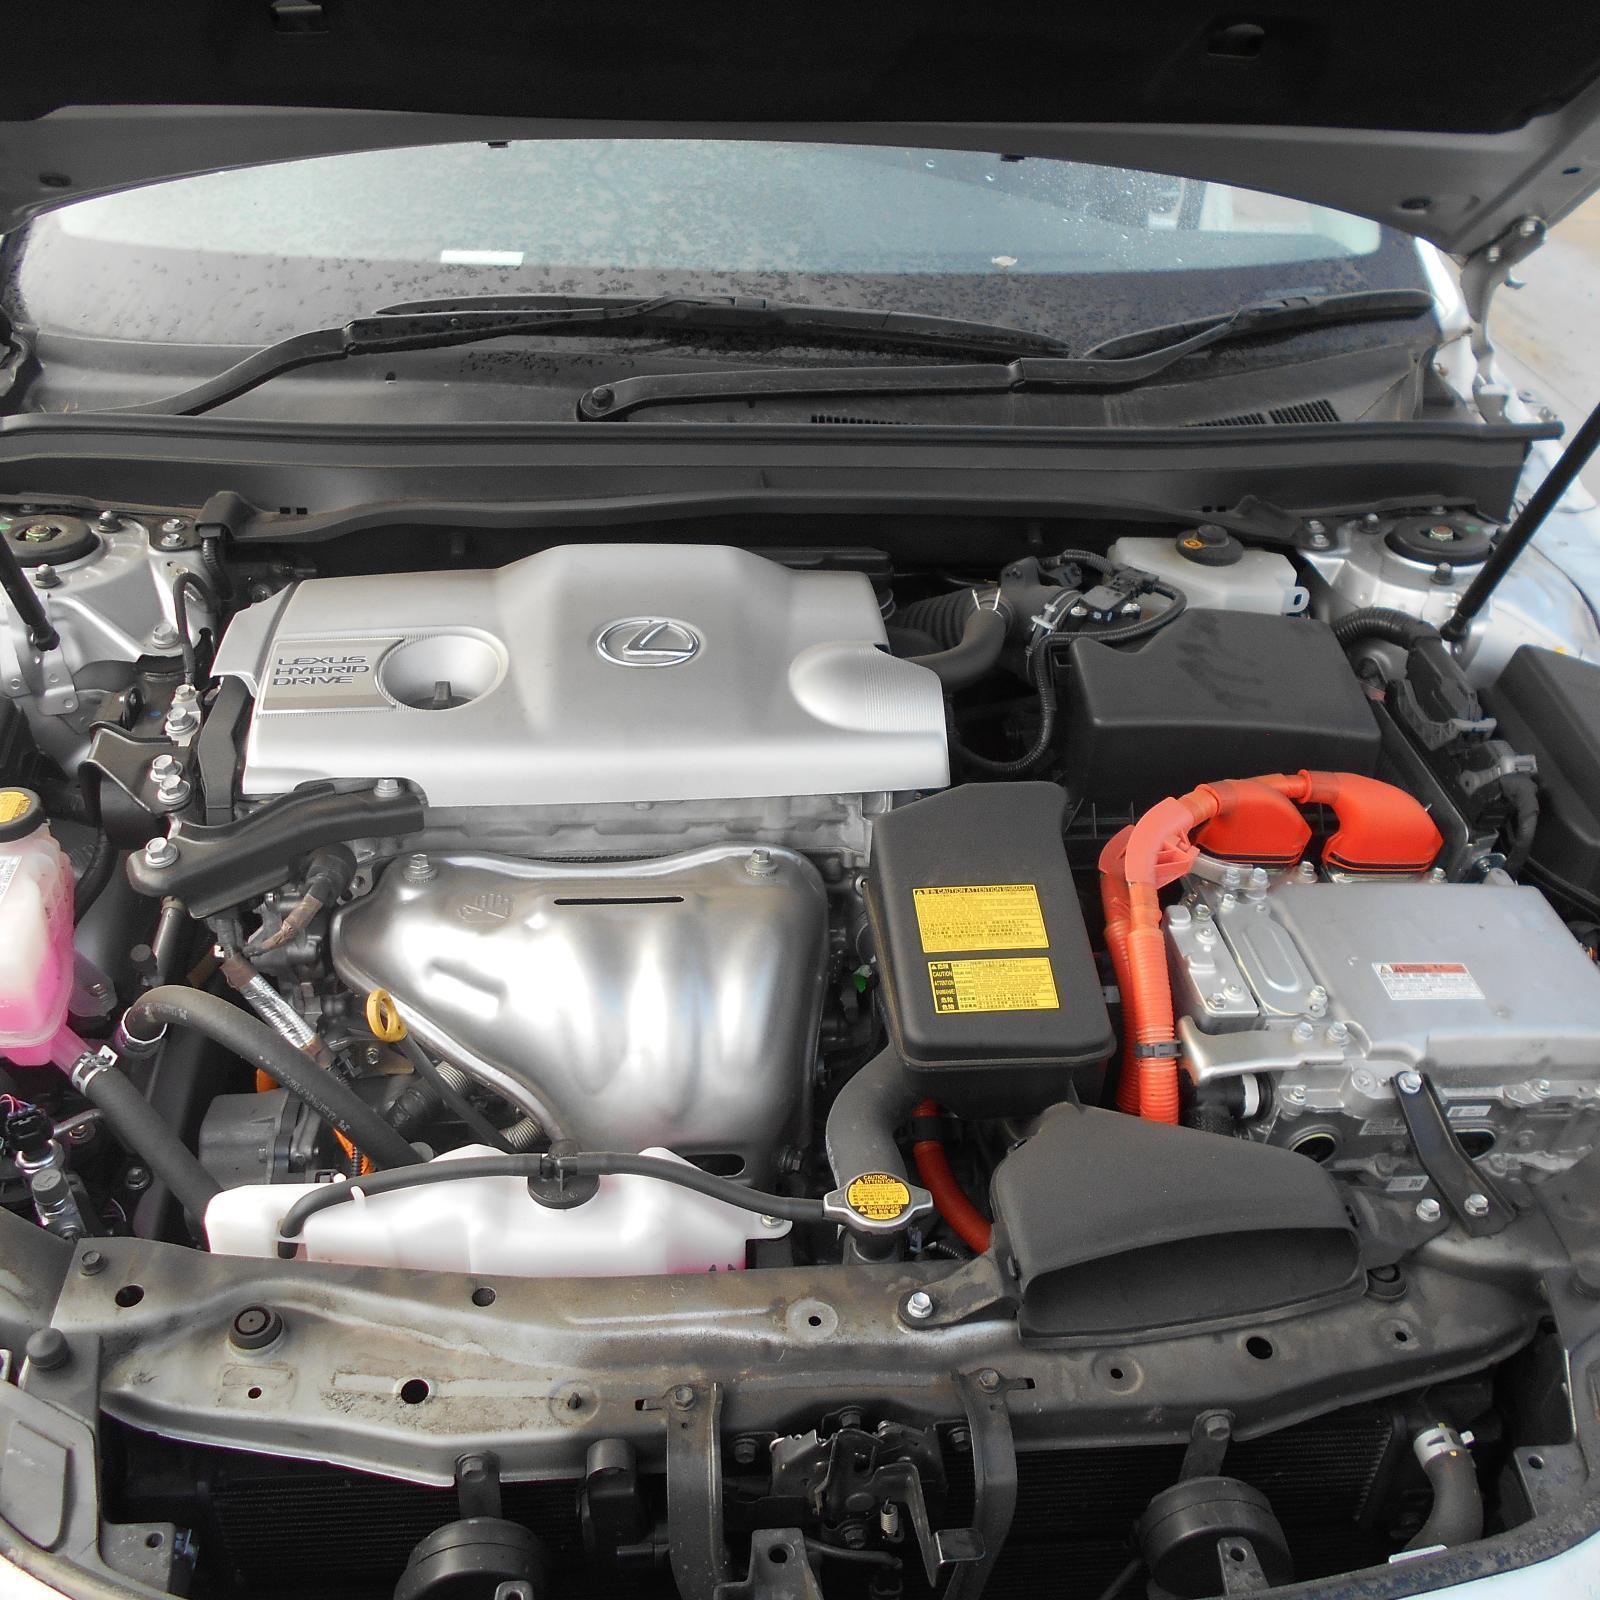 LEXUS ES350, Trans/Gearbox, AUTO, PETROL, 2.5, HYBRID, ES300H, AVV60R/GSV60R, 11/13-